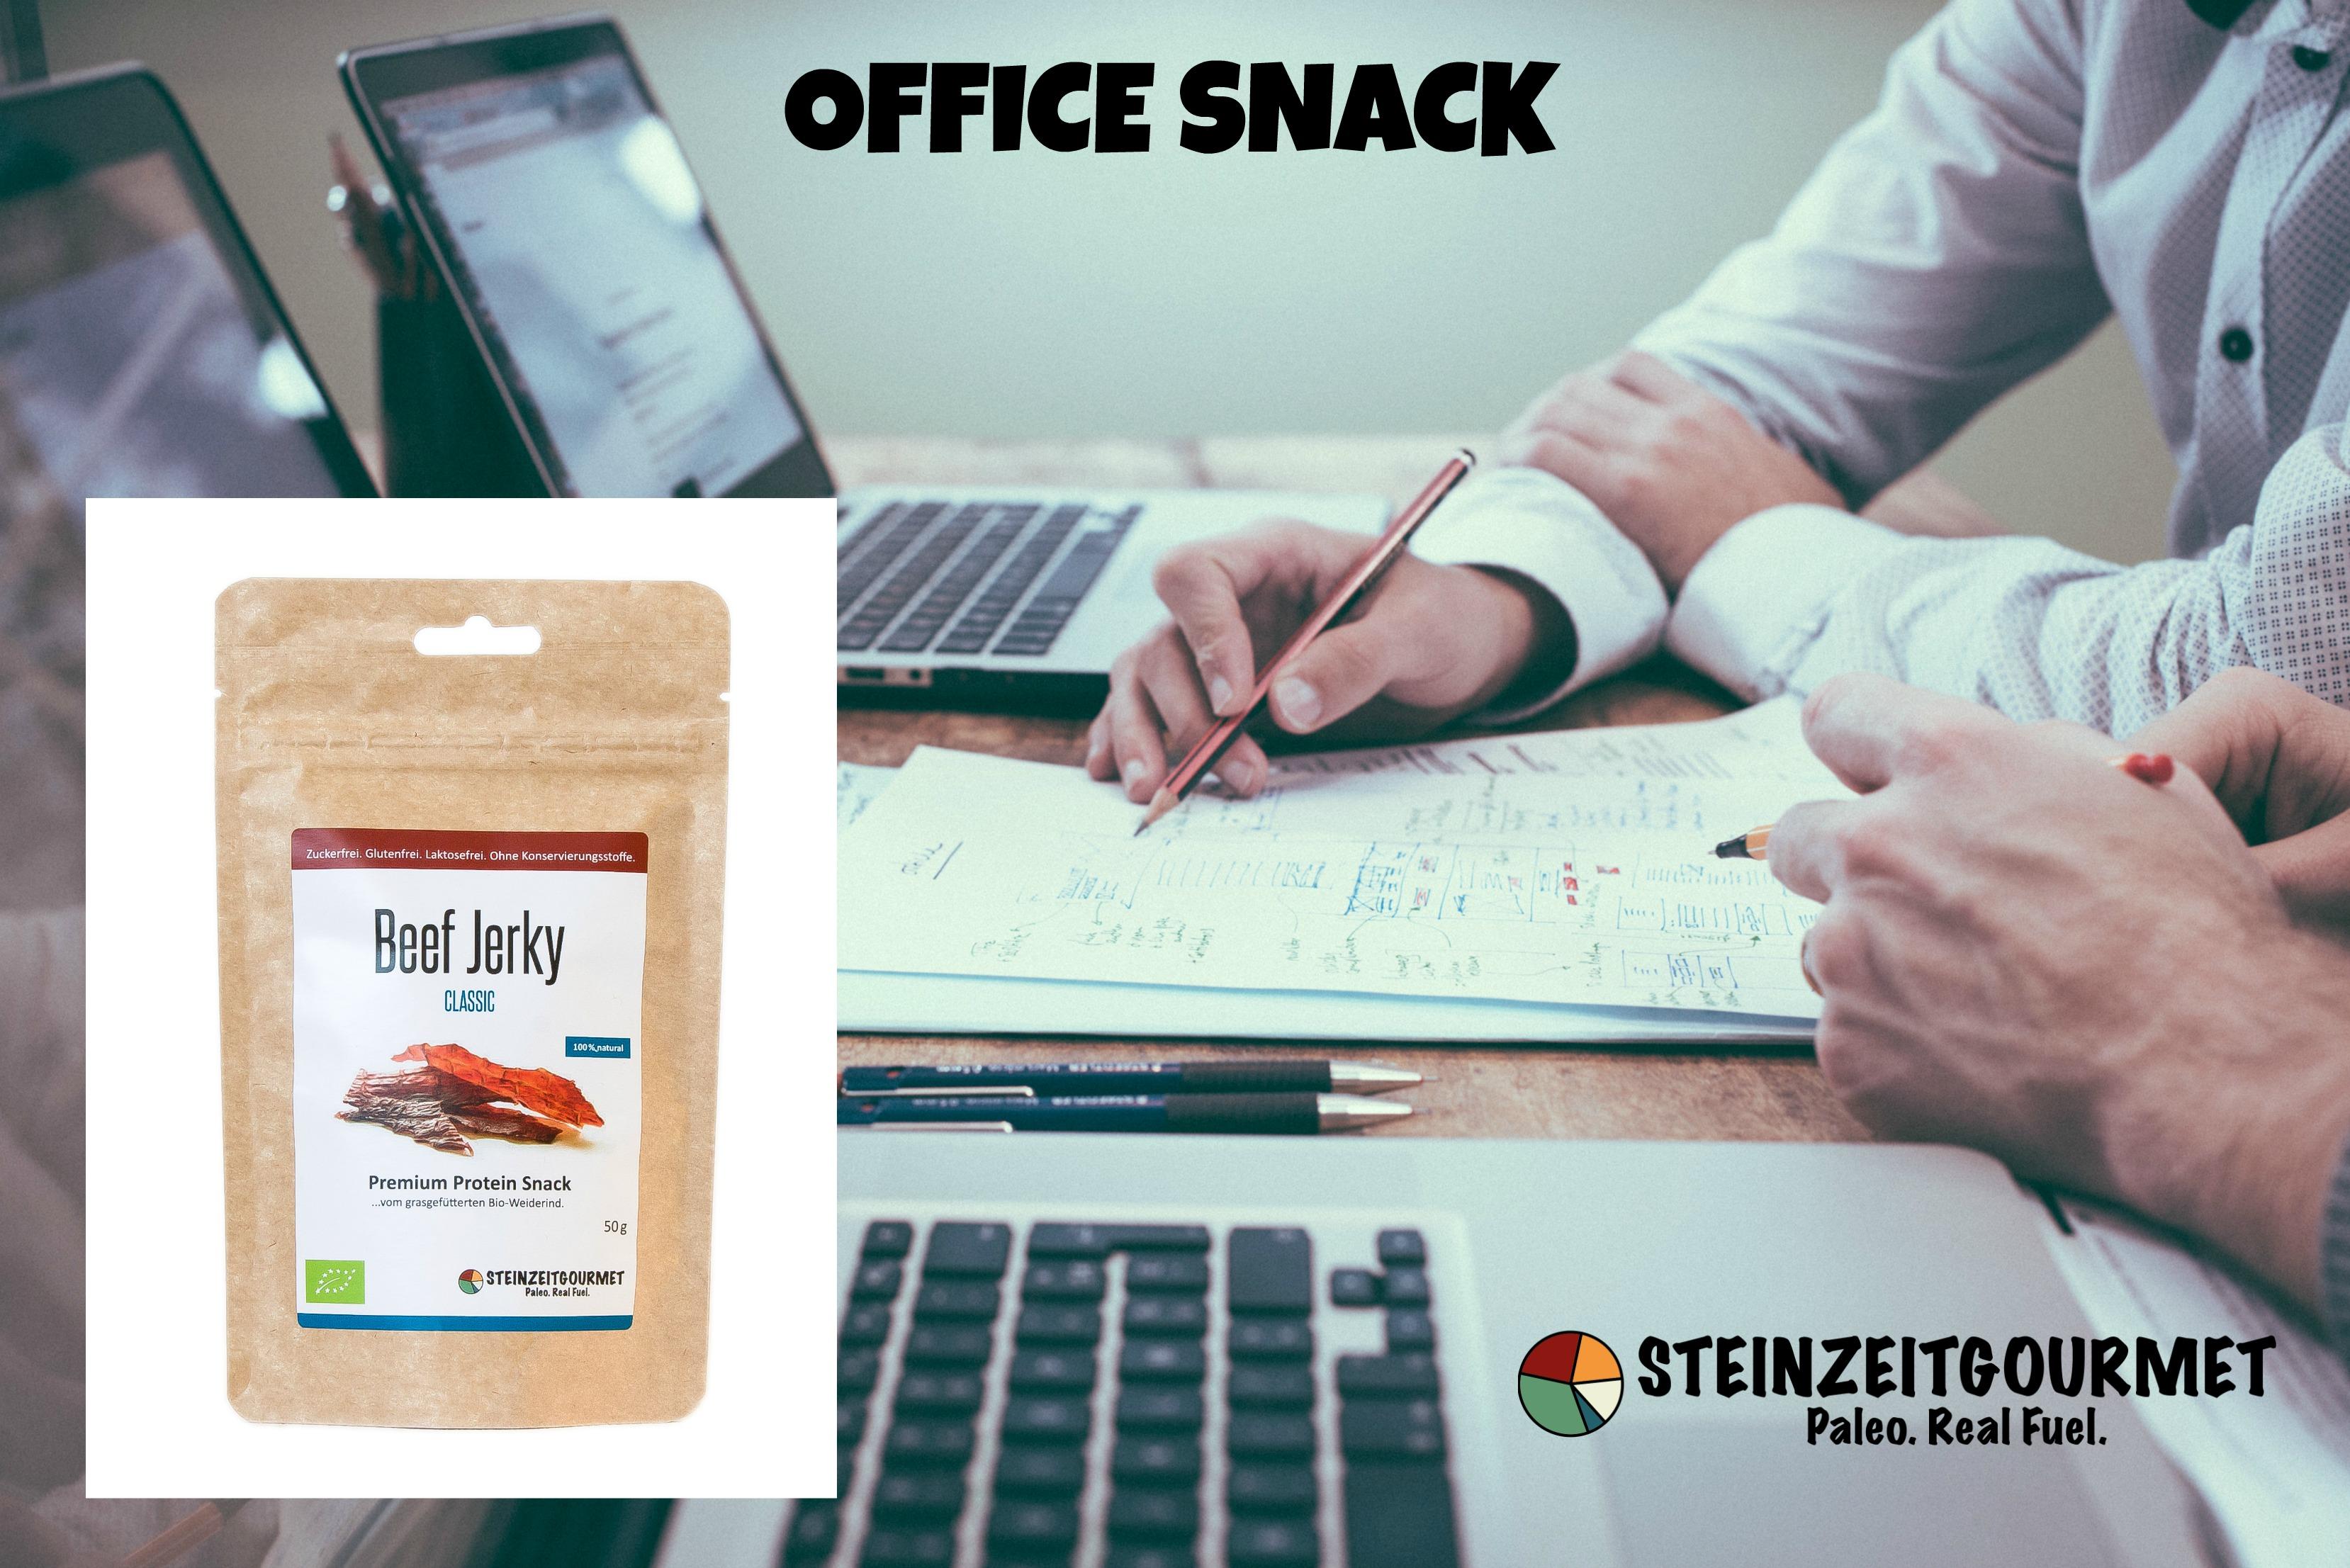 Office Snack - Beef Jerky